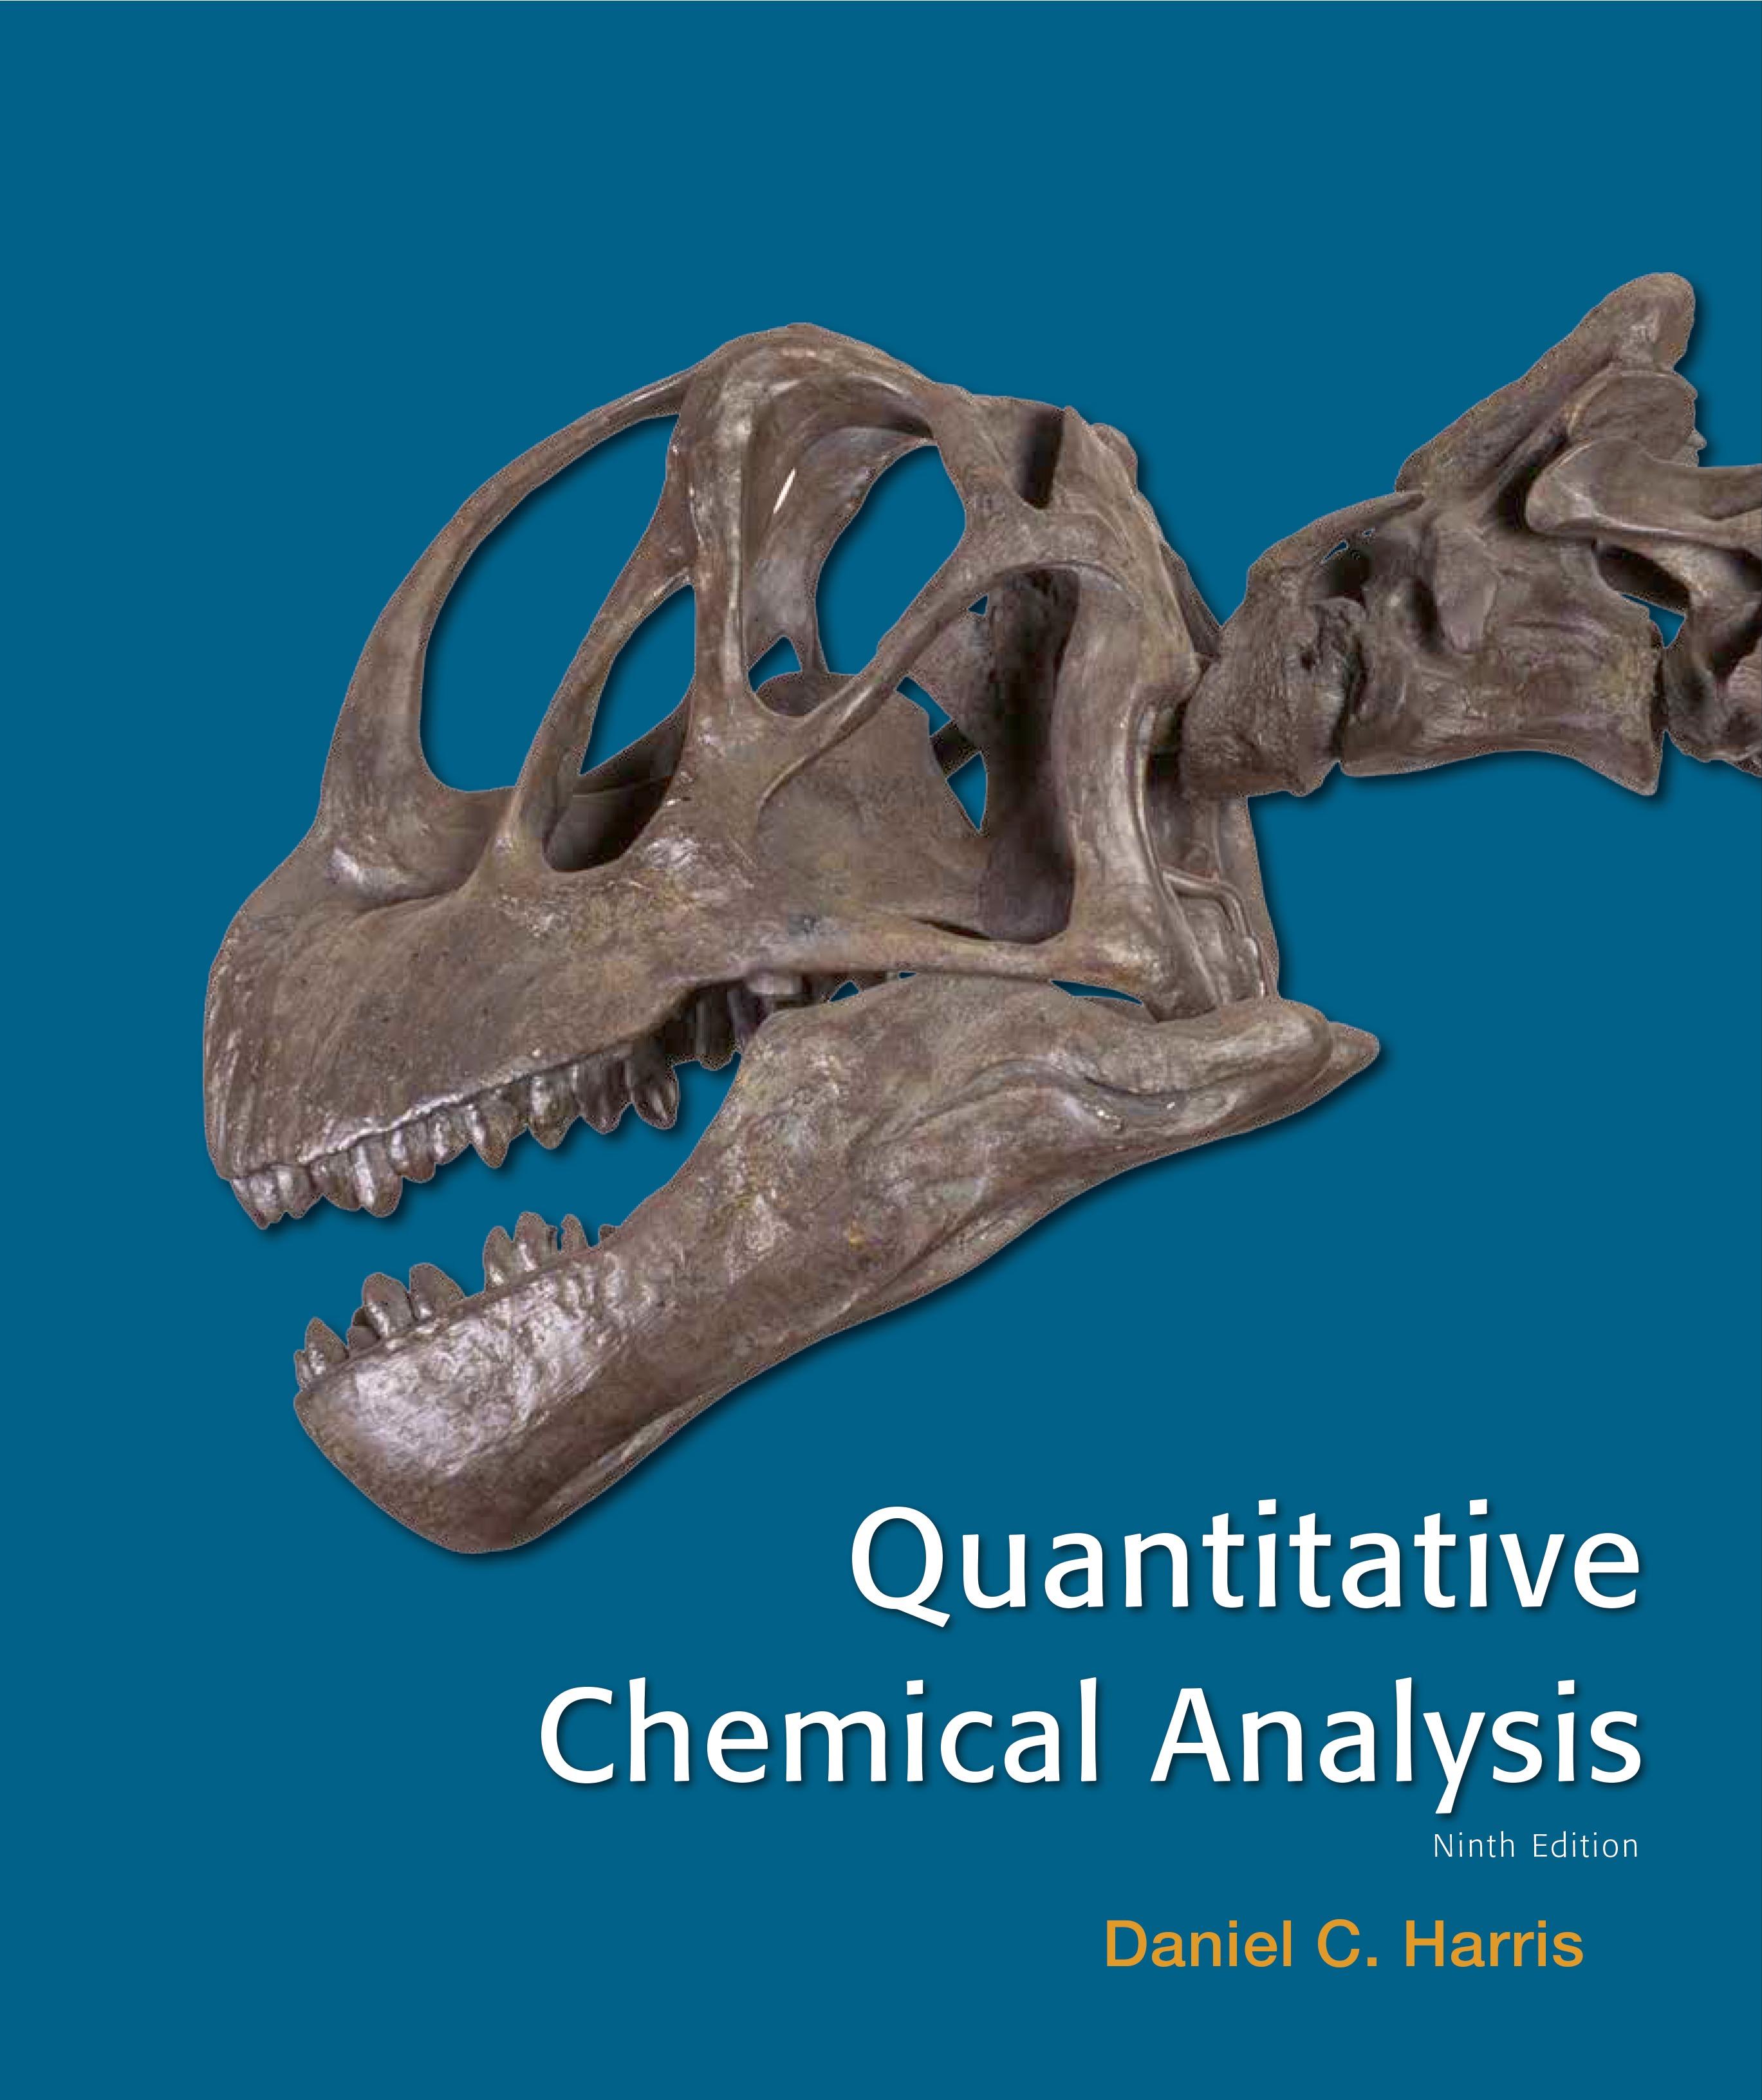 Quantitative chemical analysis (Book )